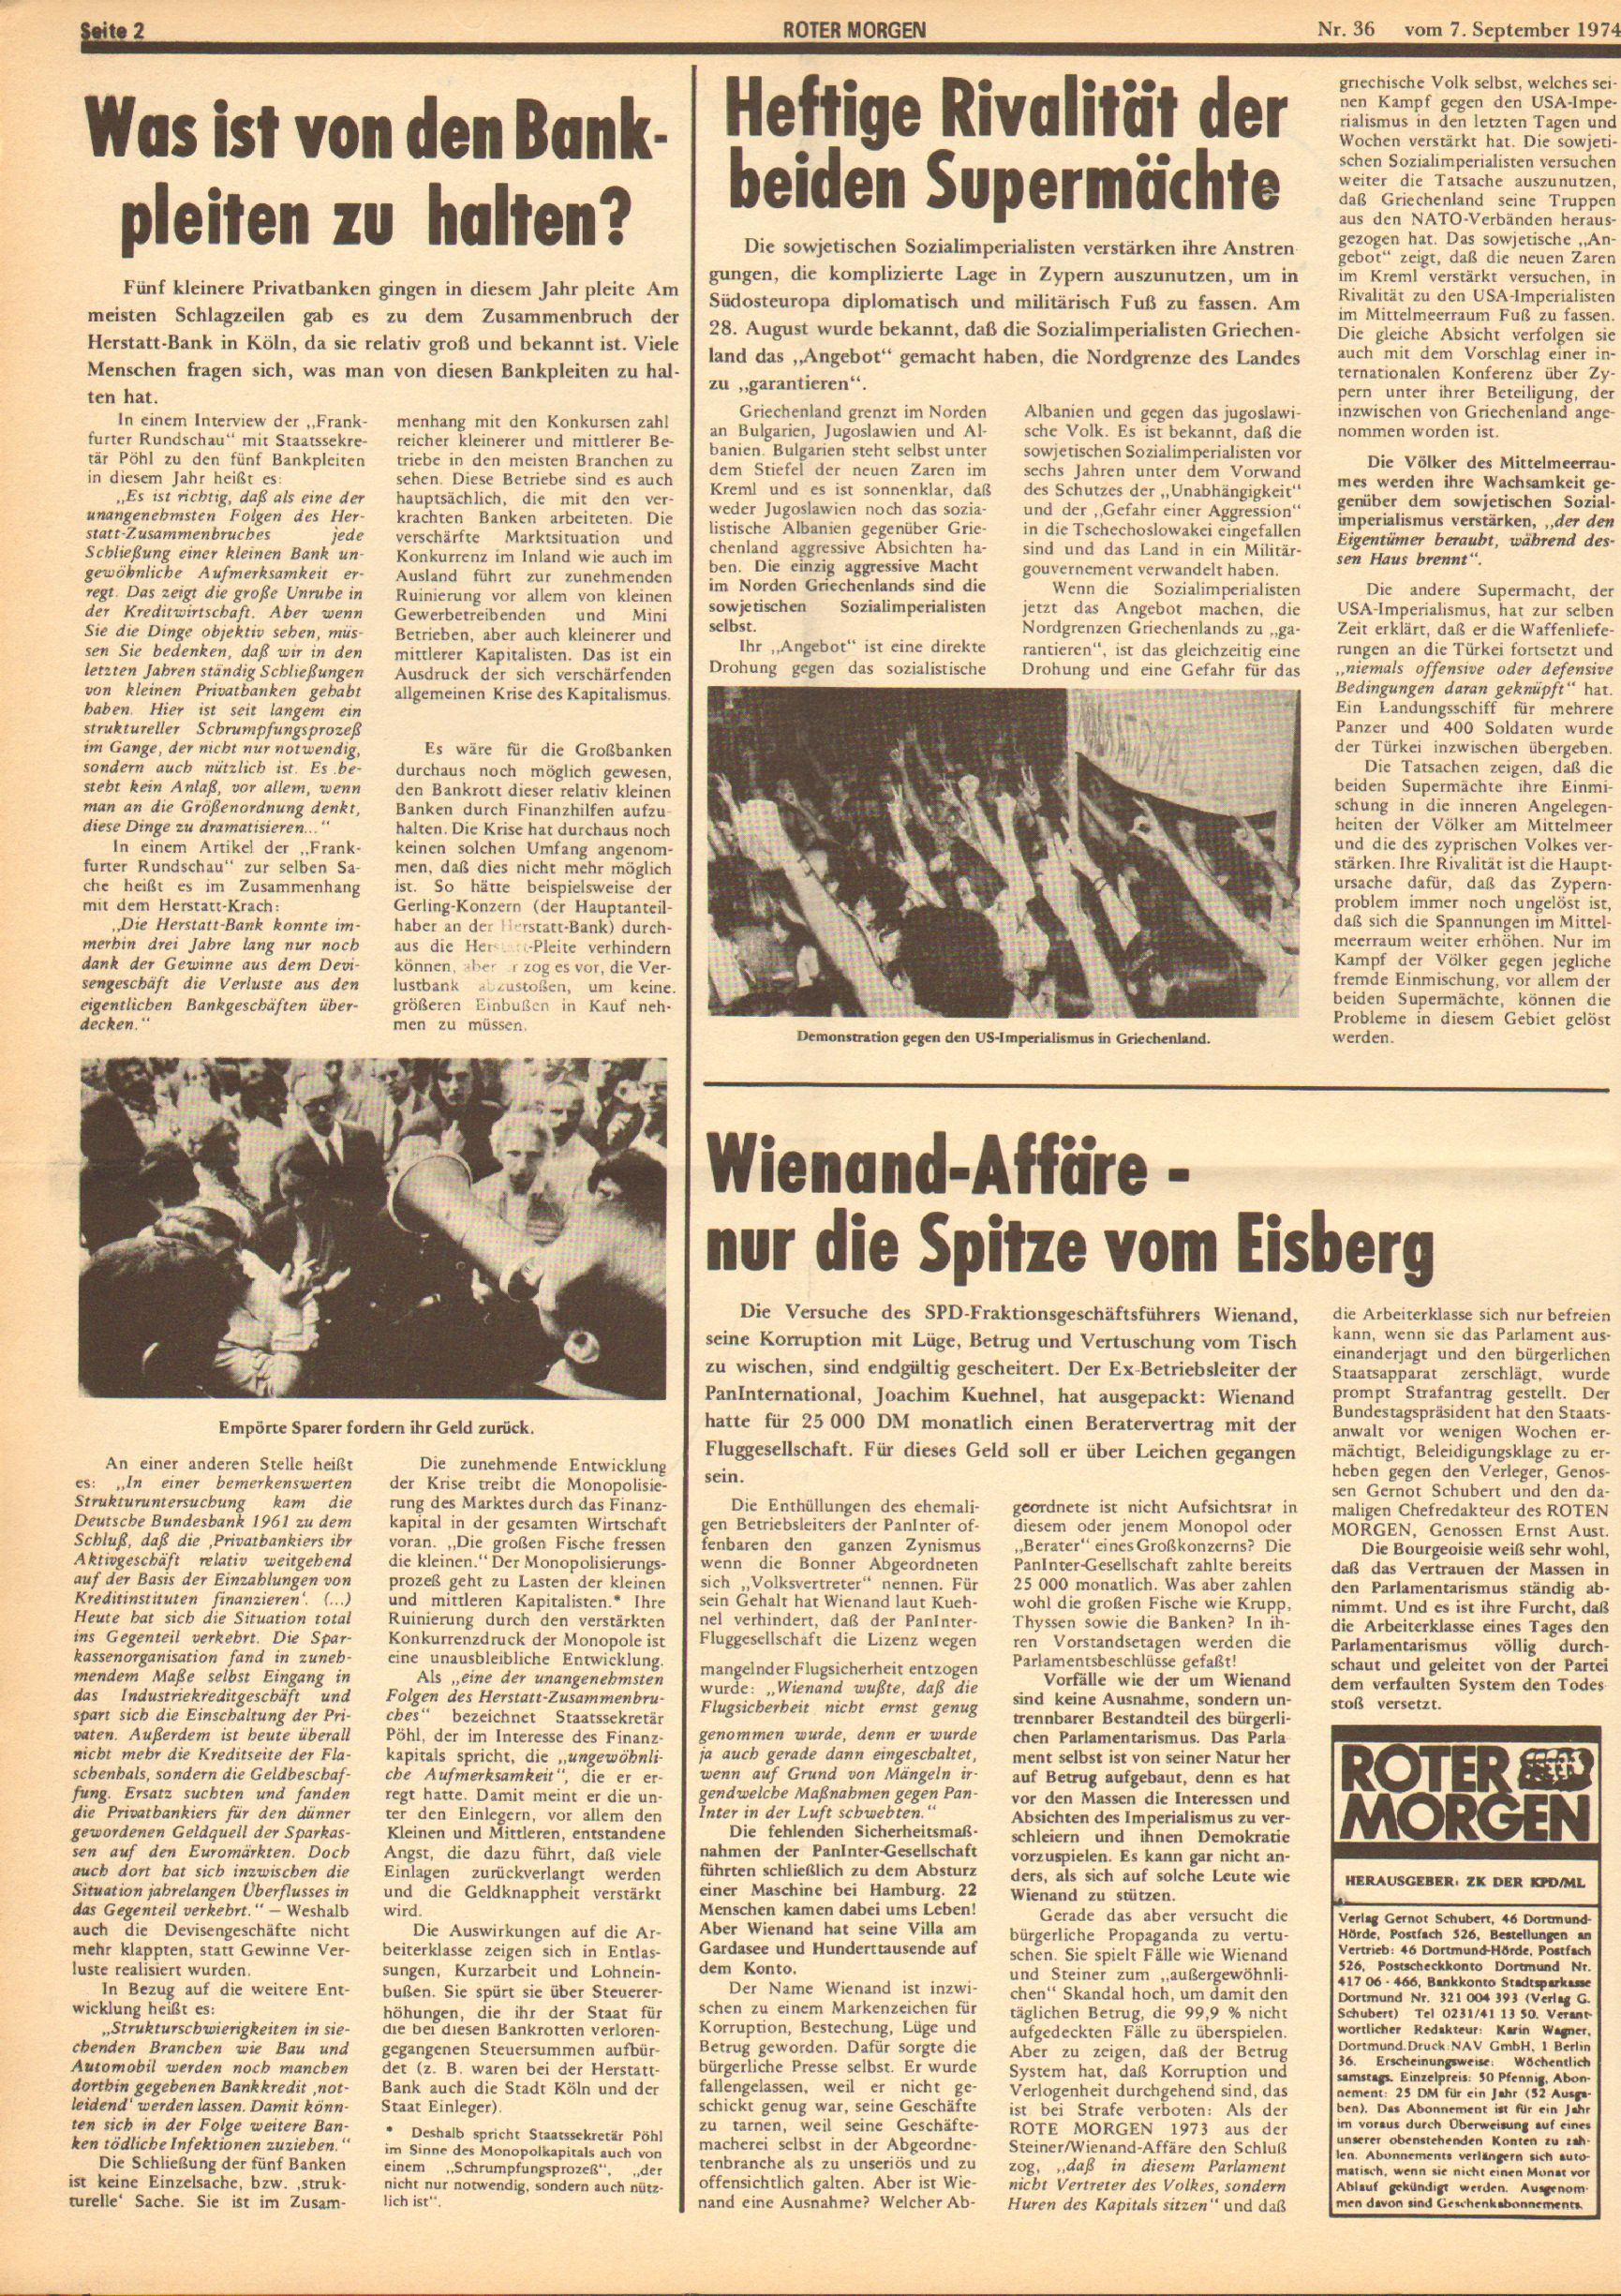 Roter Morgen, 8. Jg., 7. September 1974, Nr. 36, Seite 2